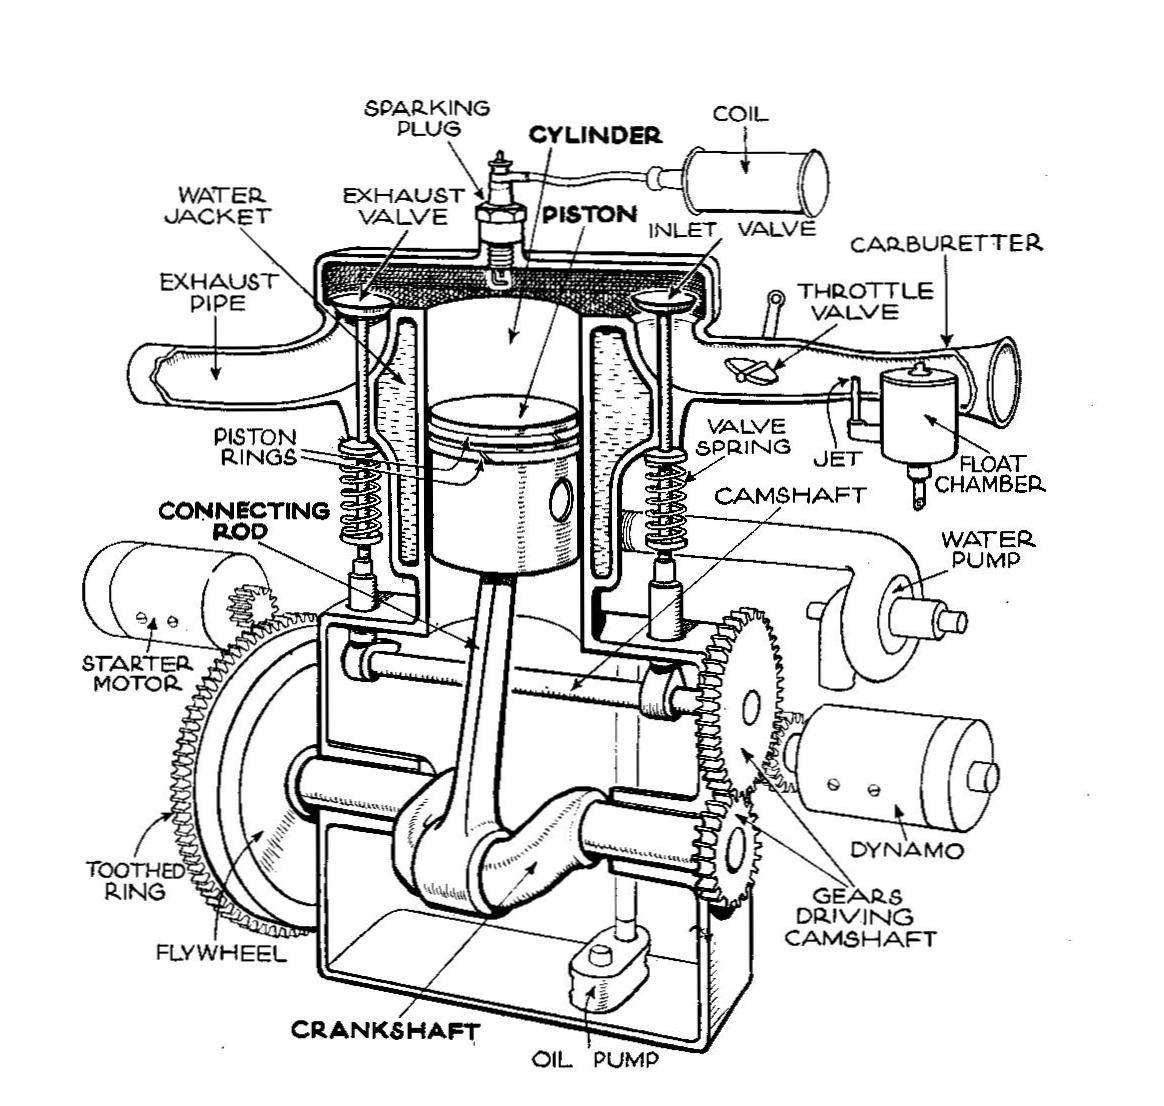 medium resolution of autocar wiring schematic images gallery single cylinder t head engine autocar handbook 13th ed 1935